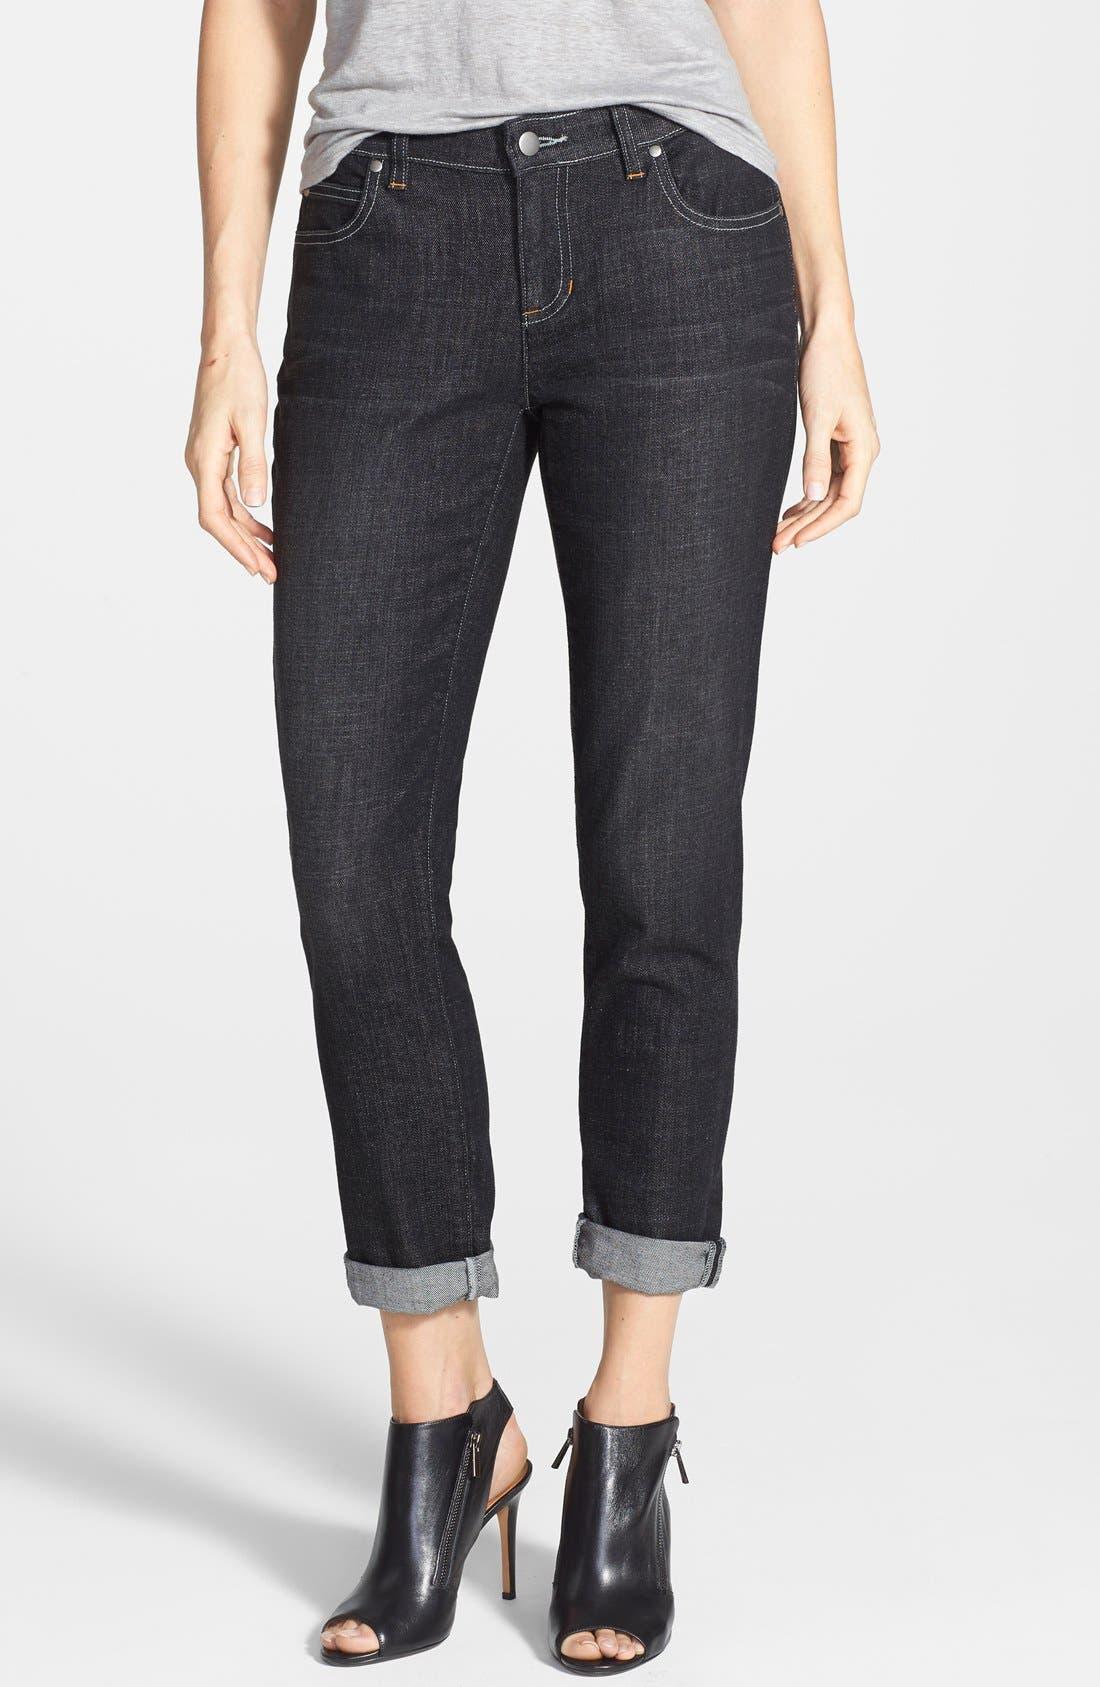 Alternate Image 1 Selected - Eileen Fisher Organic Cotton Boyfriend Jeans (Plus Size)